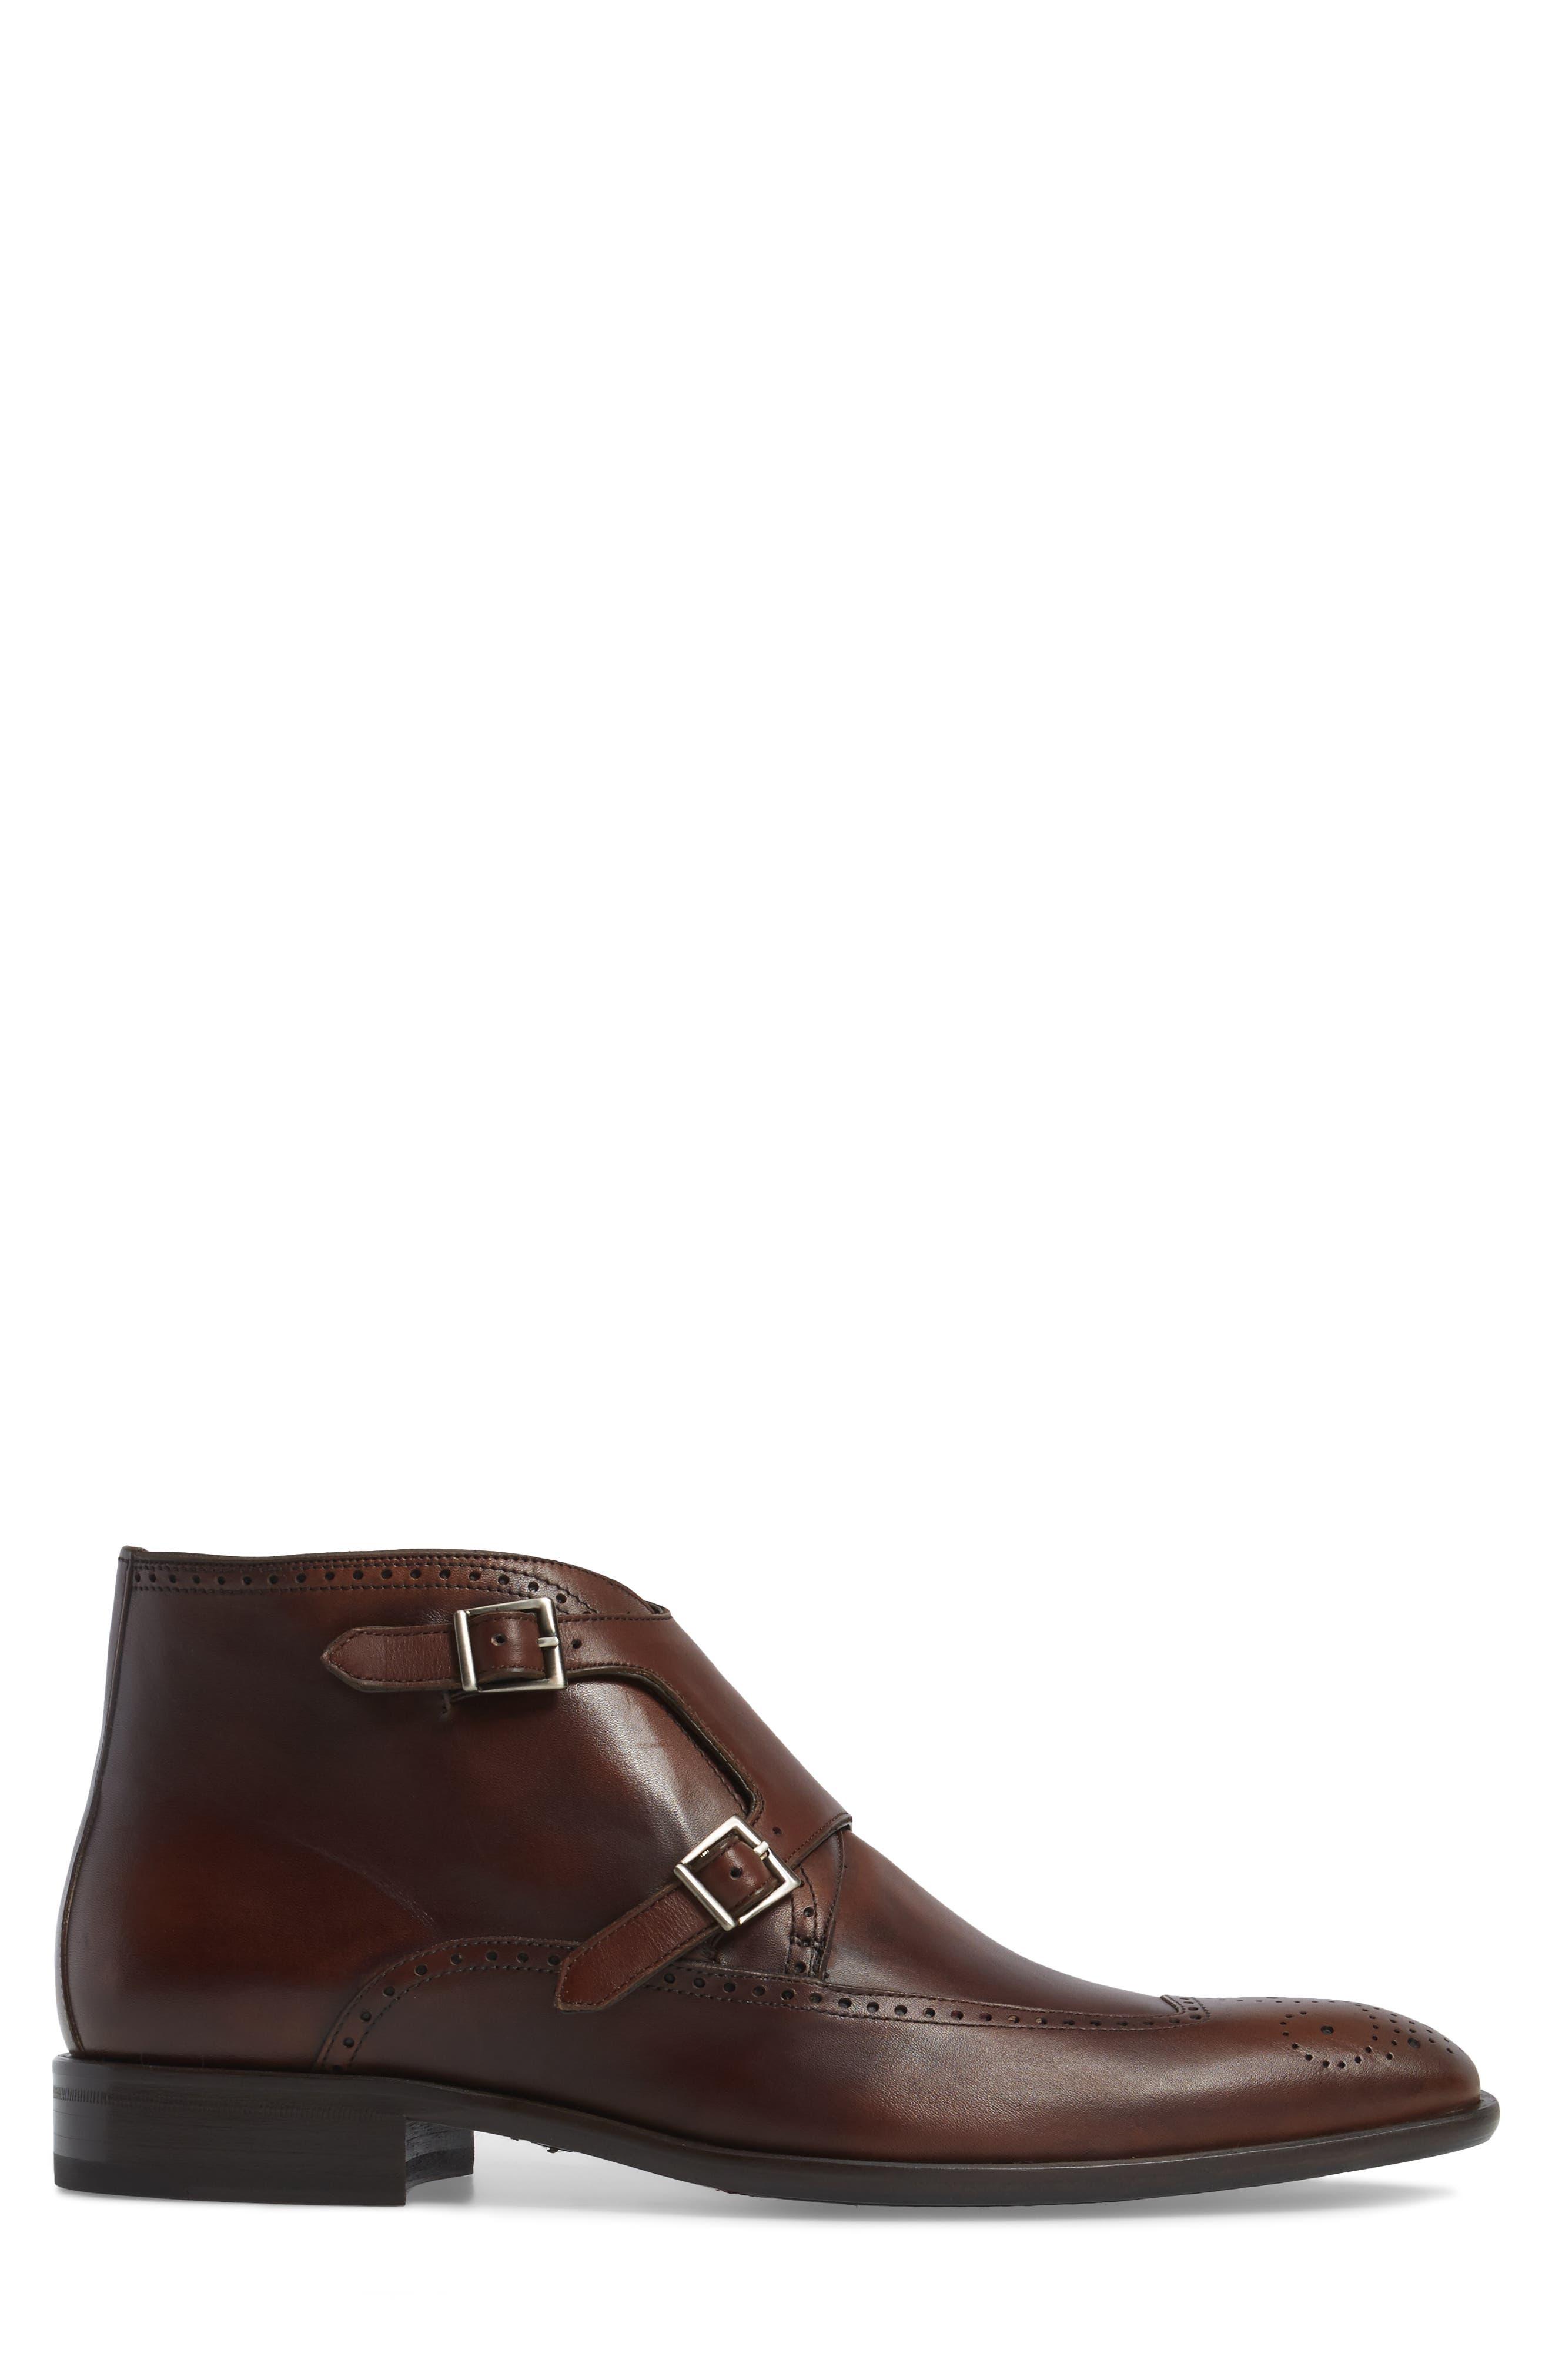 Taberna Double Monk Strap Boot,                             Alternate thumbnail 3, color,                             Cognac Leather